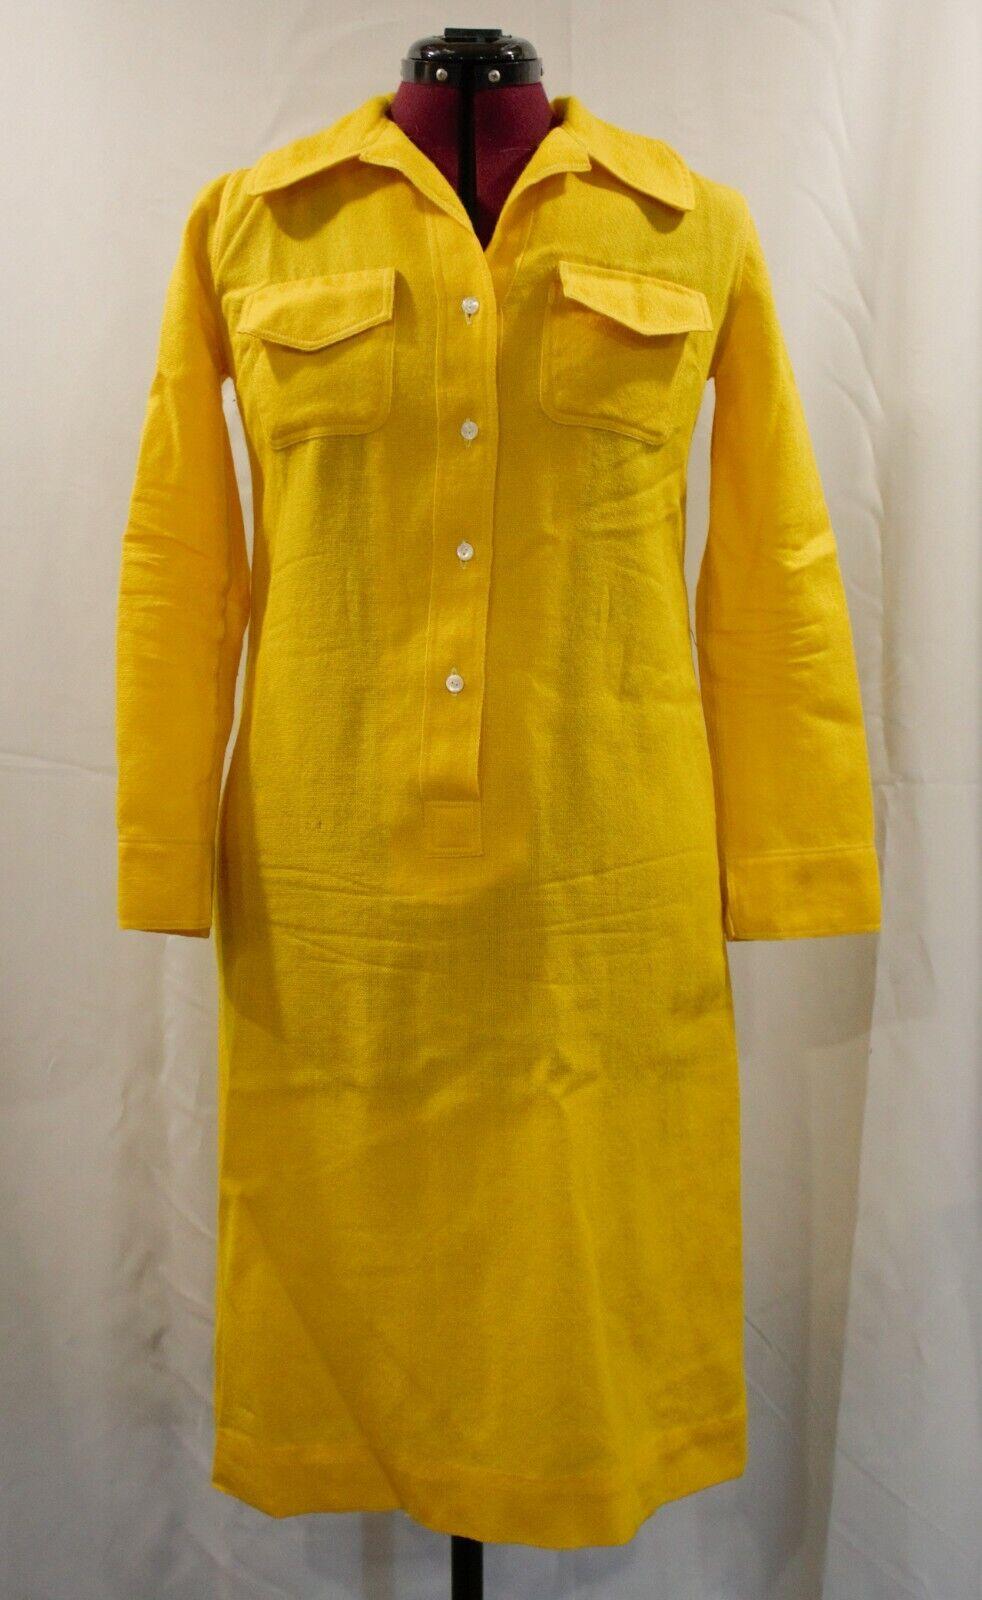 Vintage 1960's Donald Davies Bright Yellow Collar… - image 1